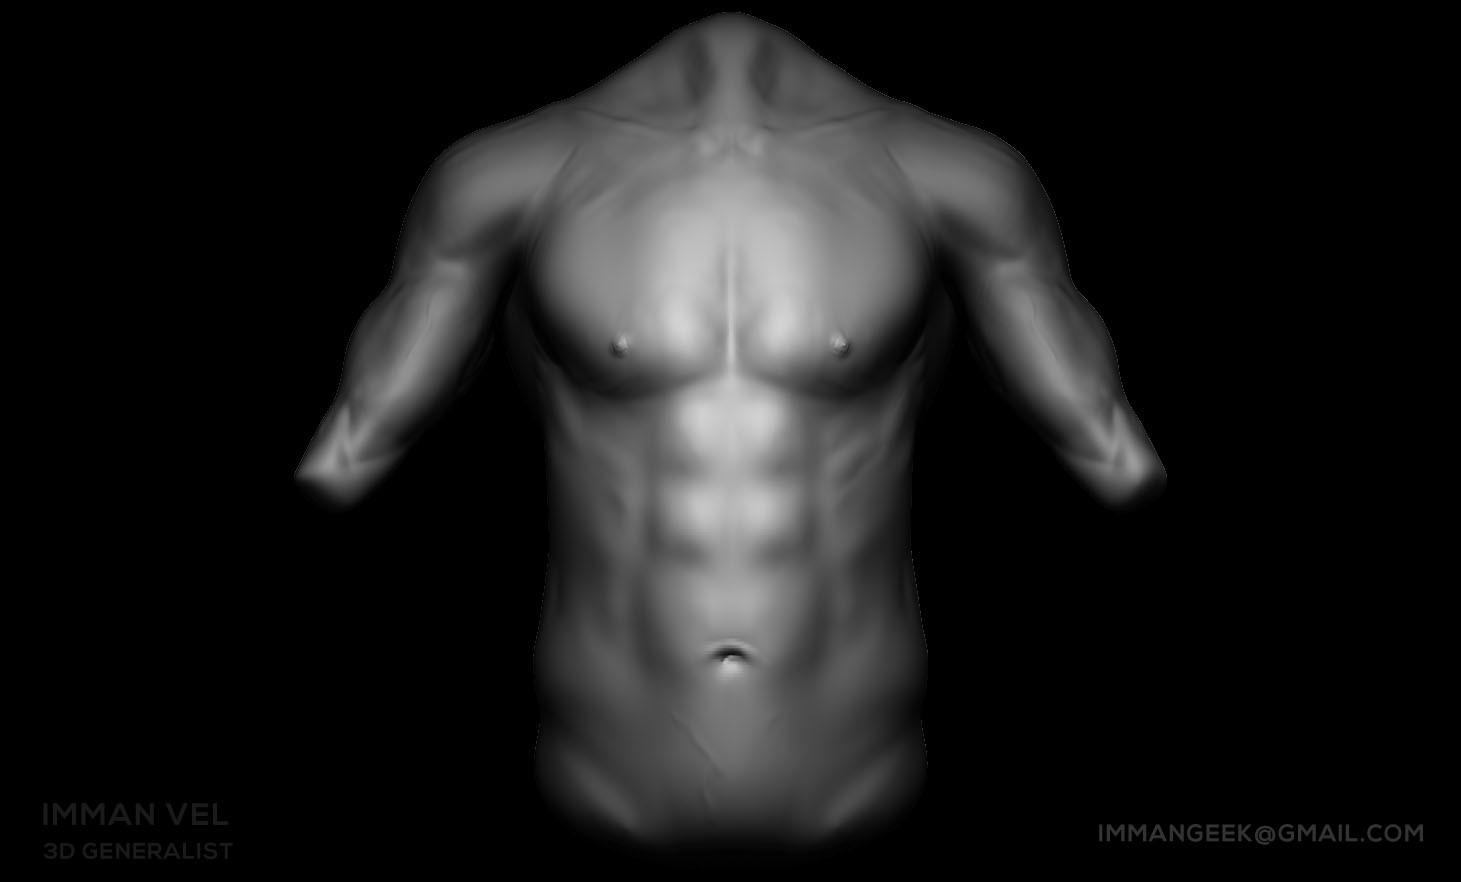 Imman Vel - Male Torso Anatomy